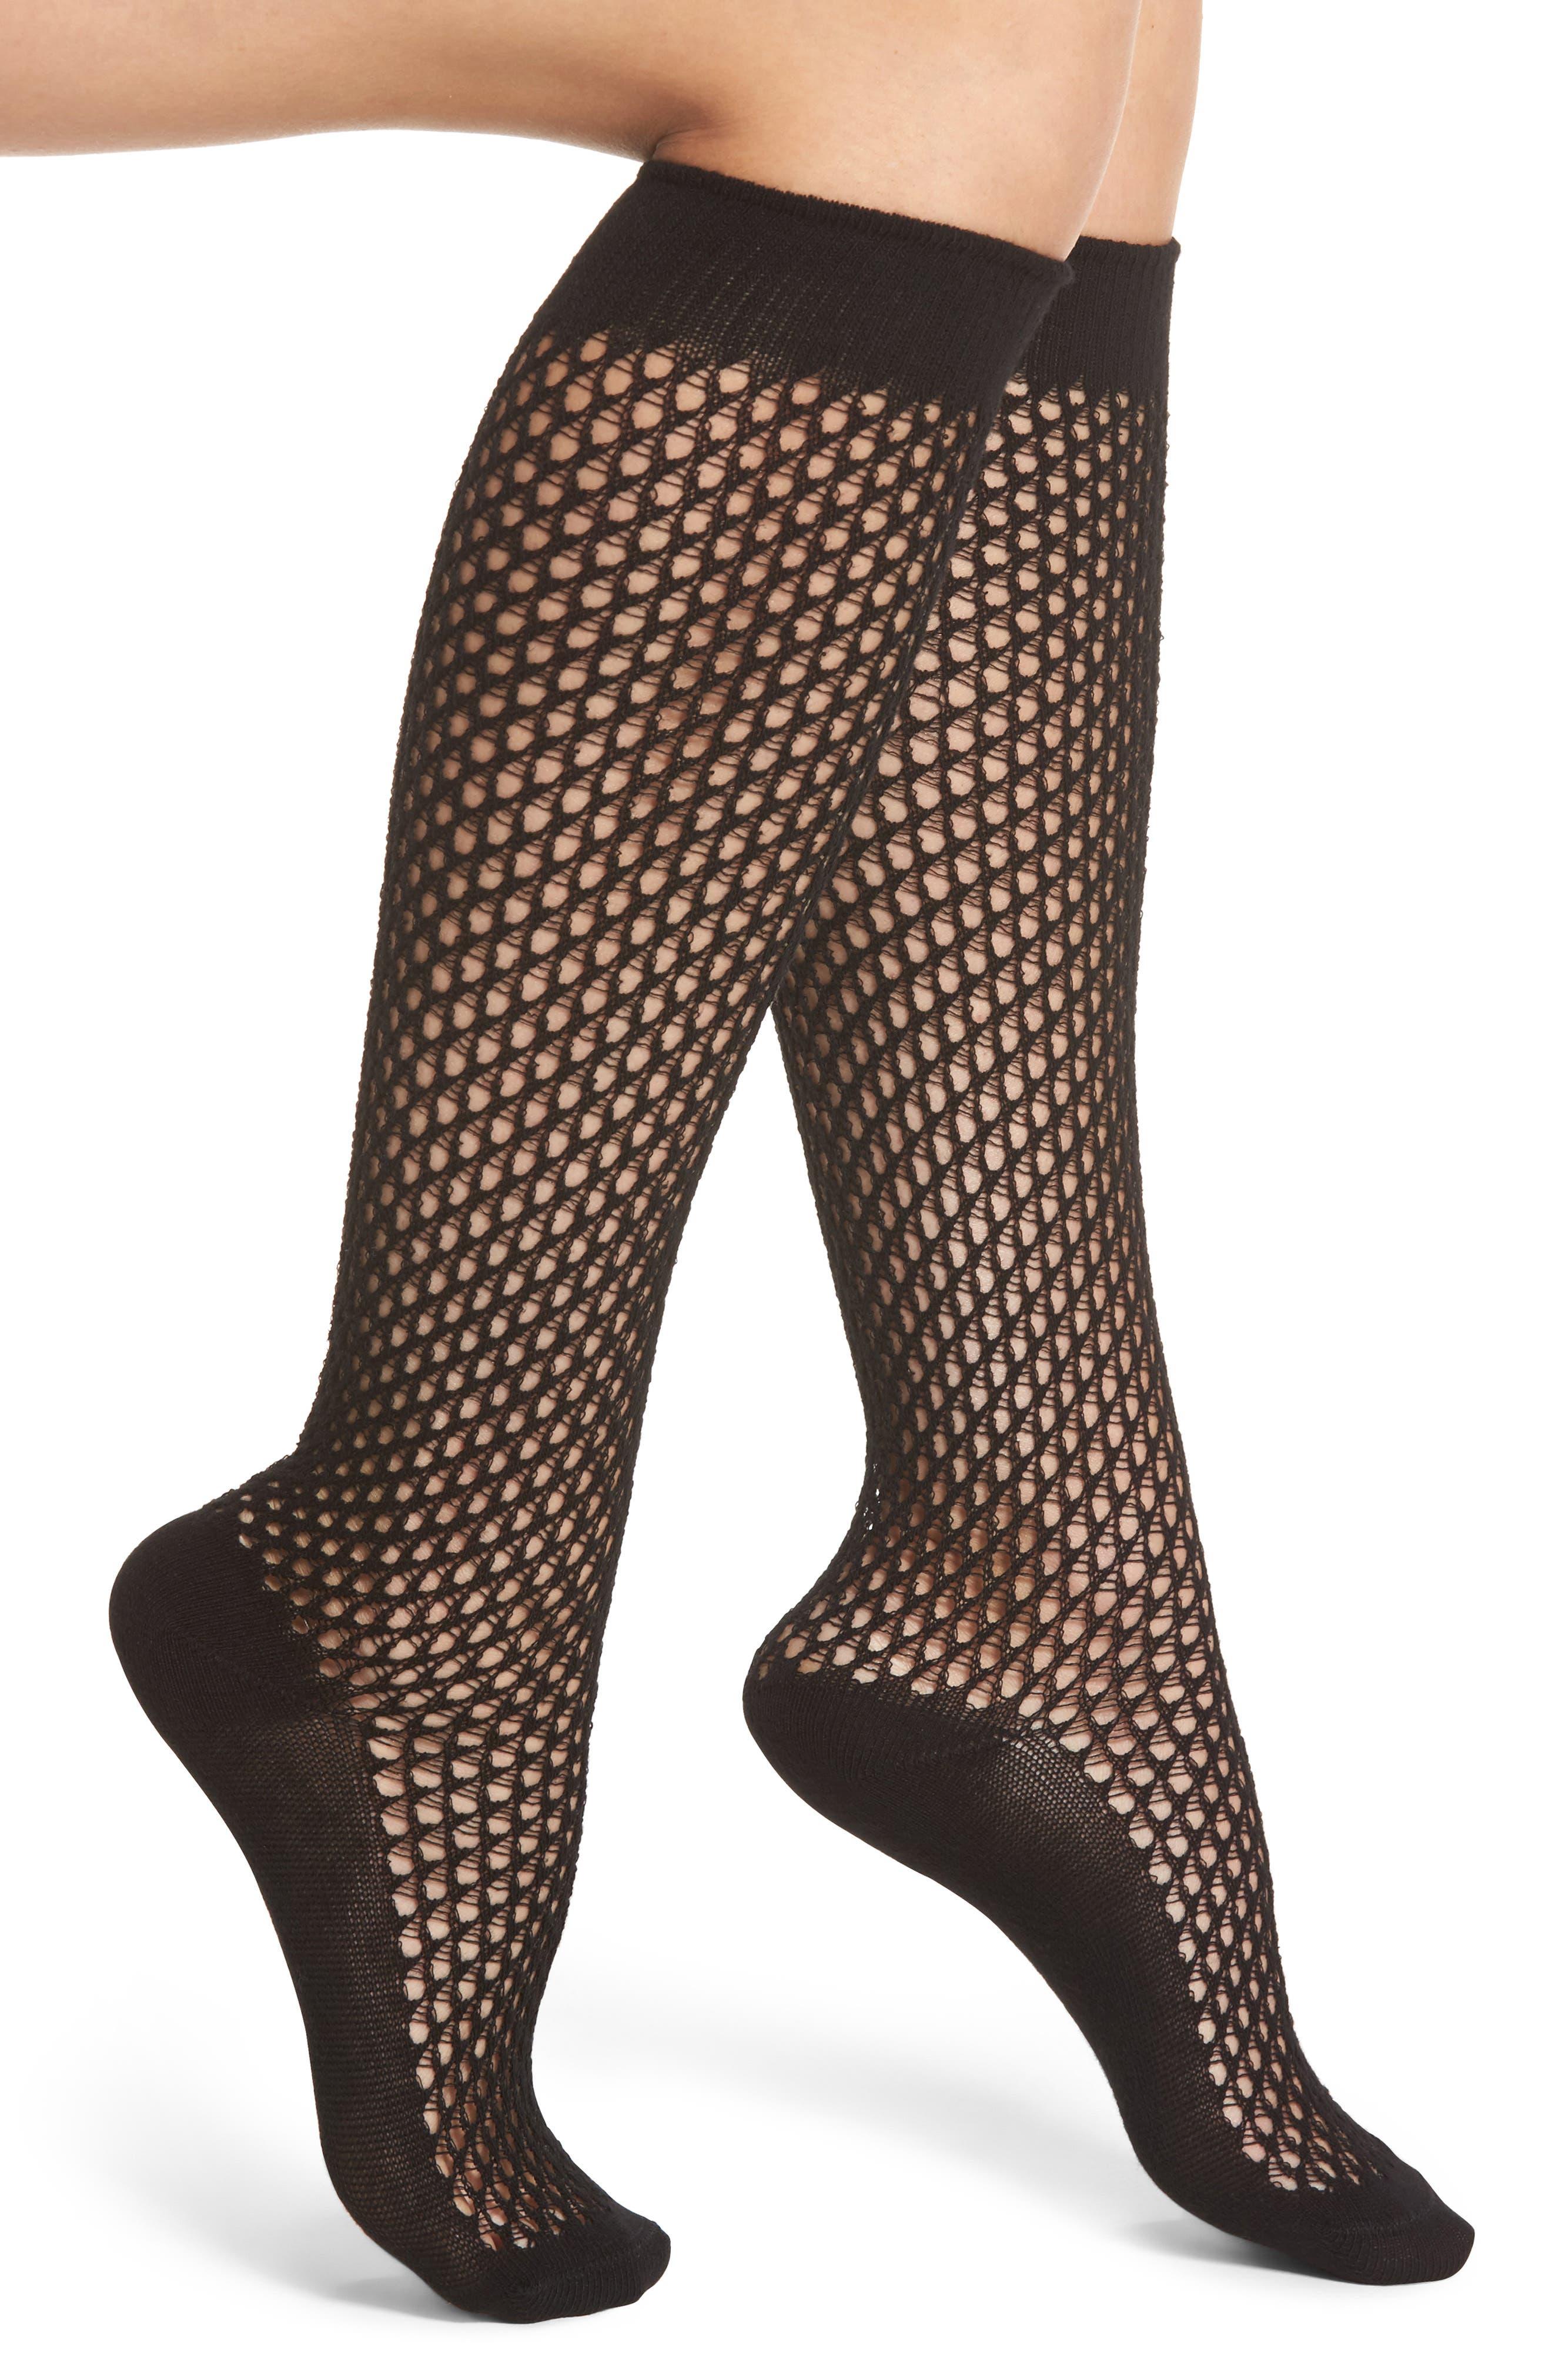 Oroblu Gabmaletto Fishnet Knee High Socks